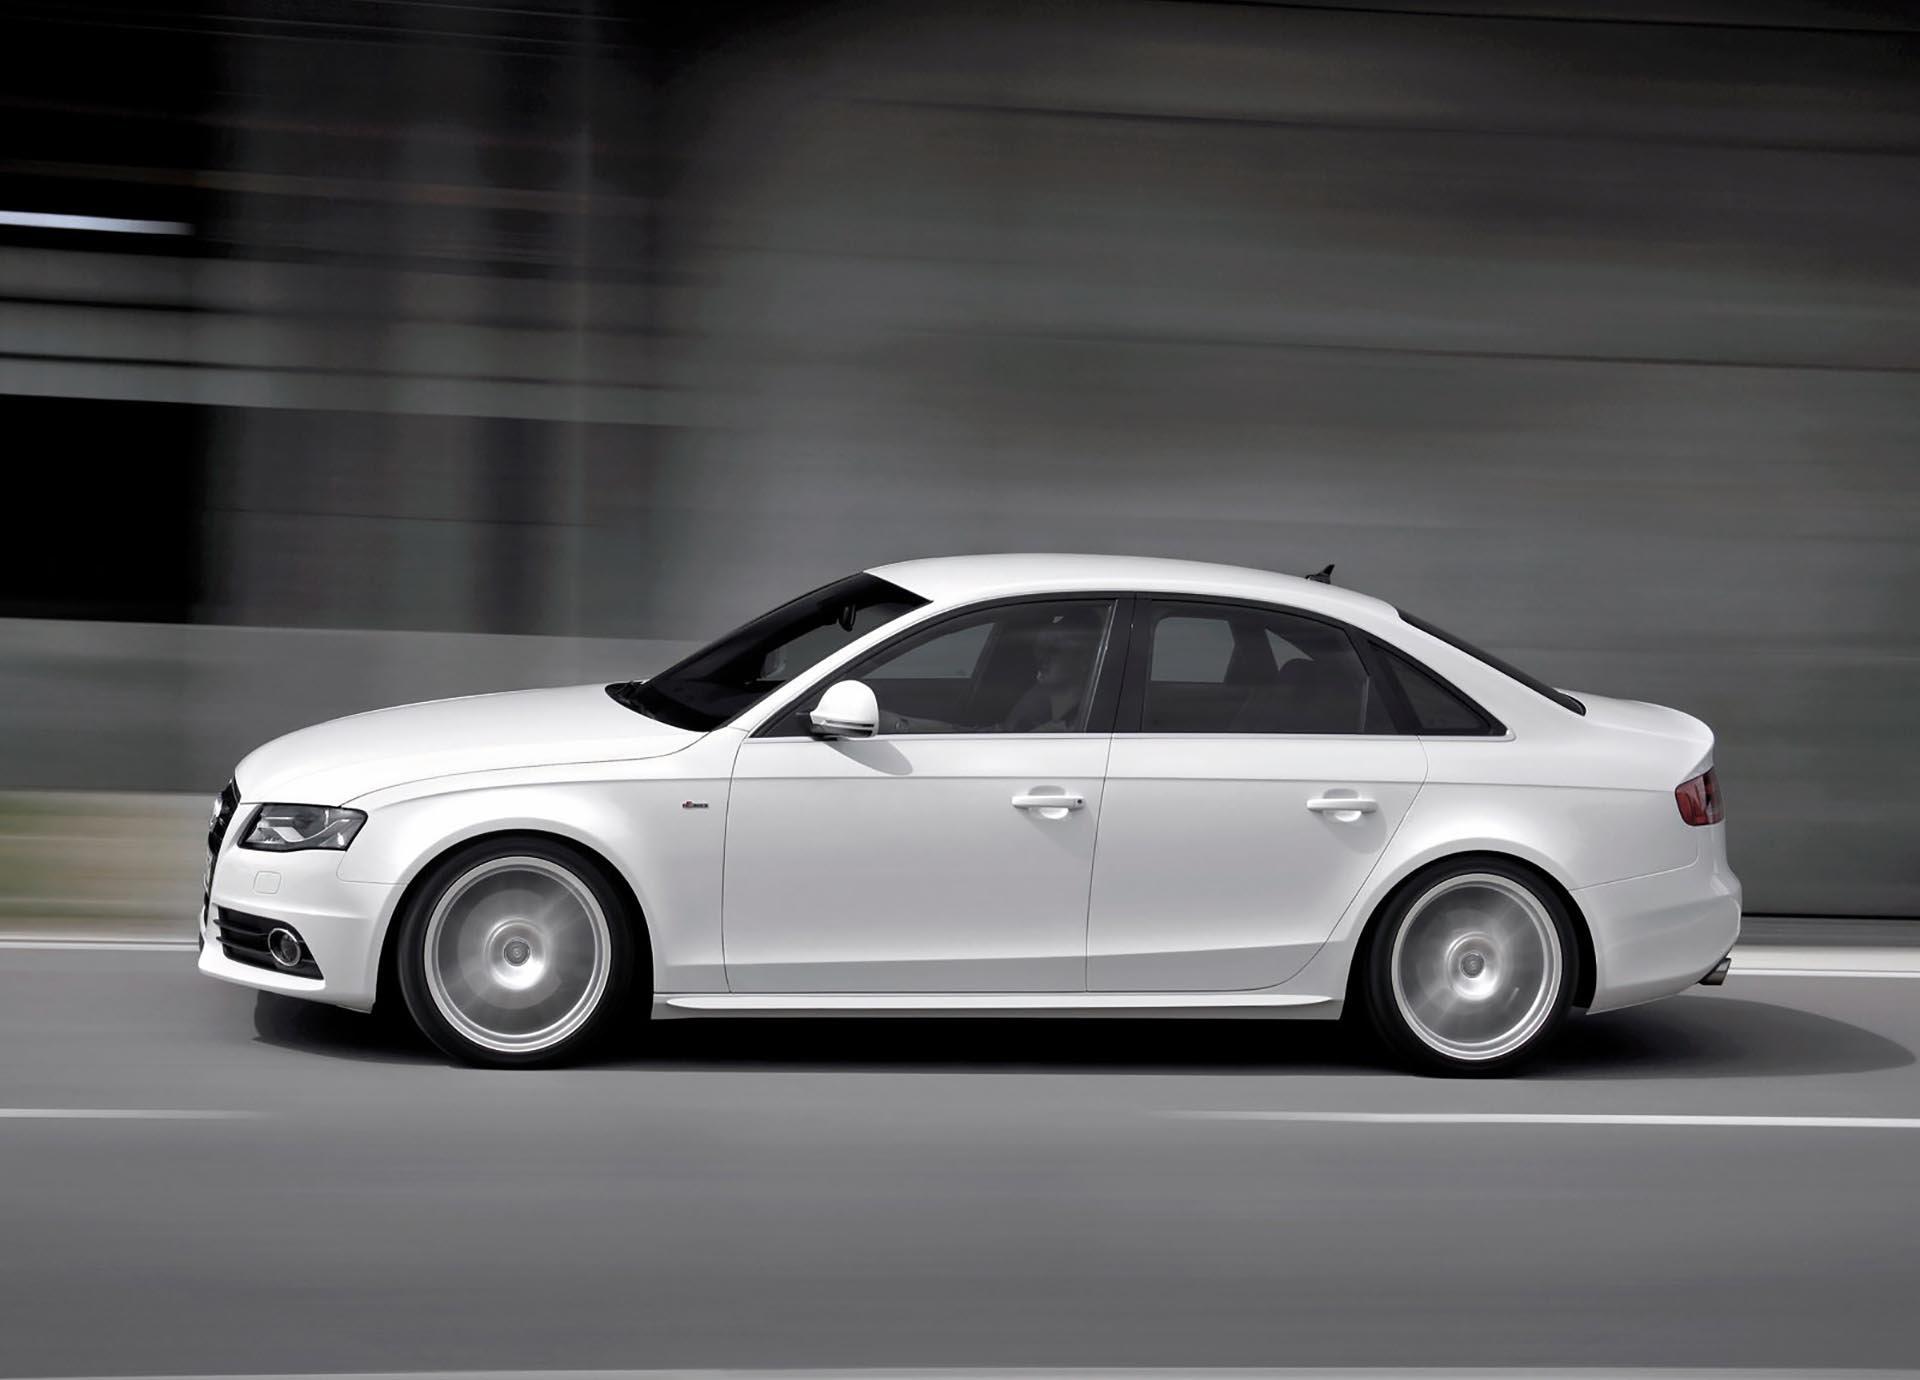 06_B8 Audi A4 S Line profile